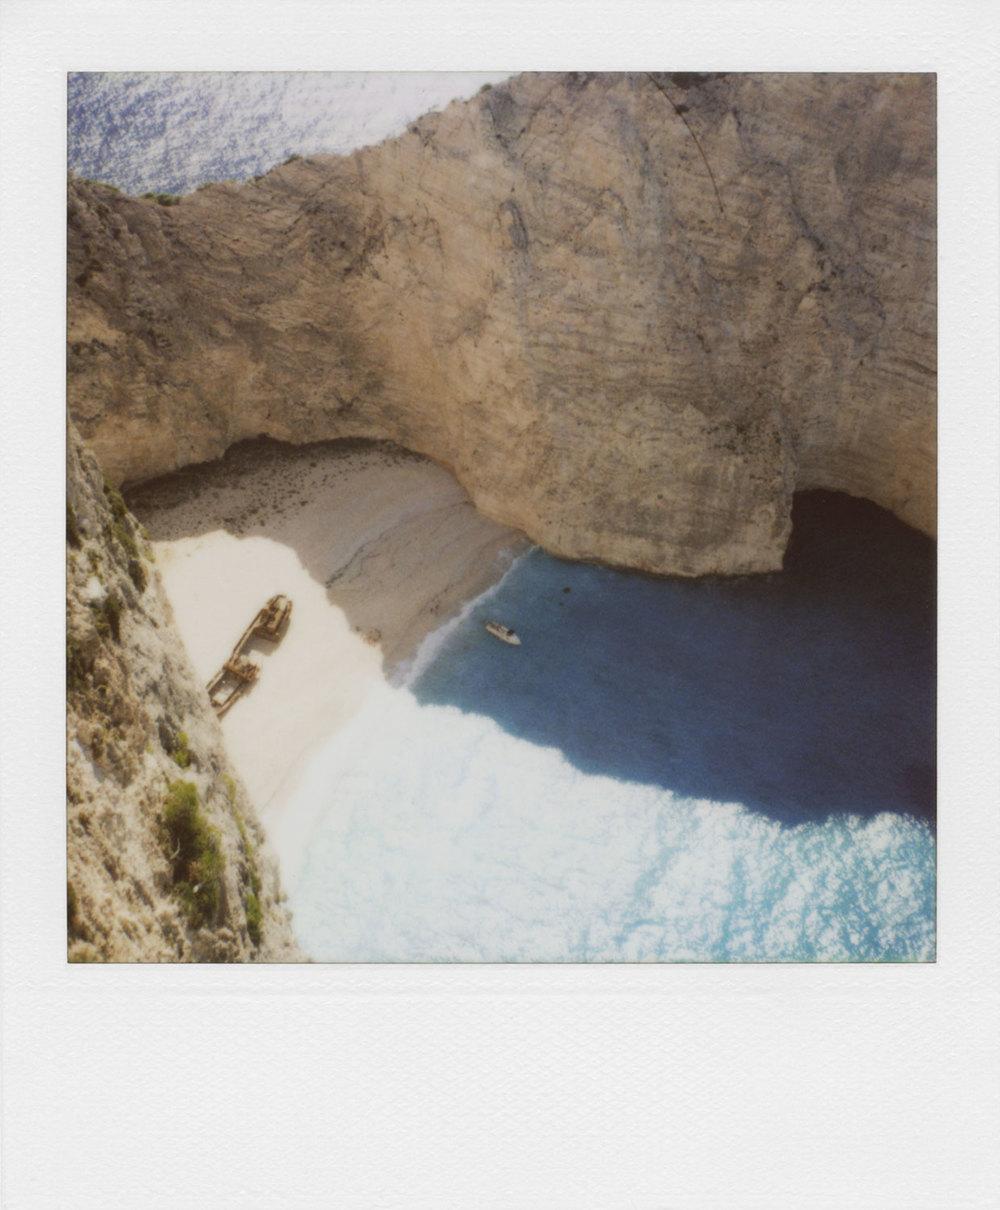 polaroid-23.jpg